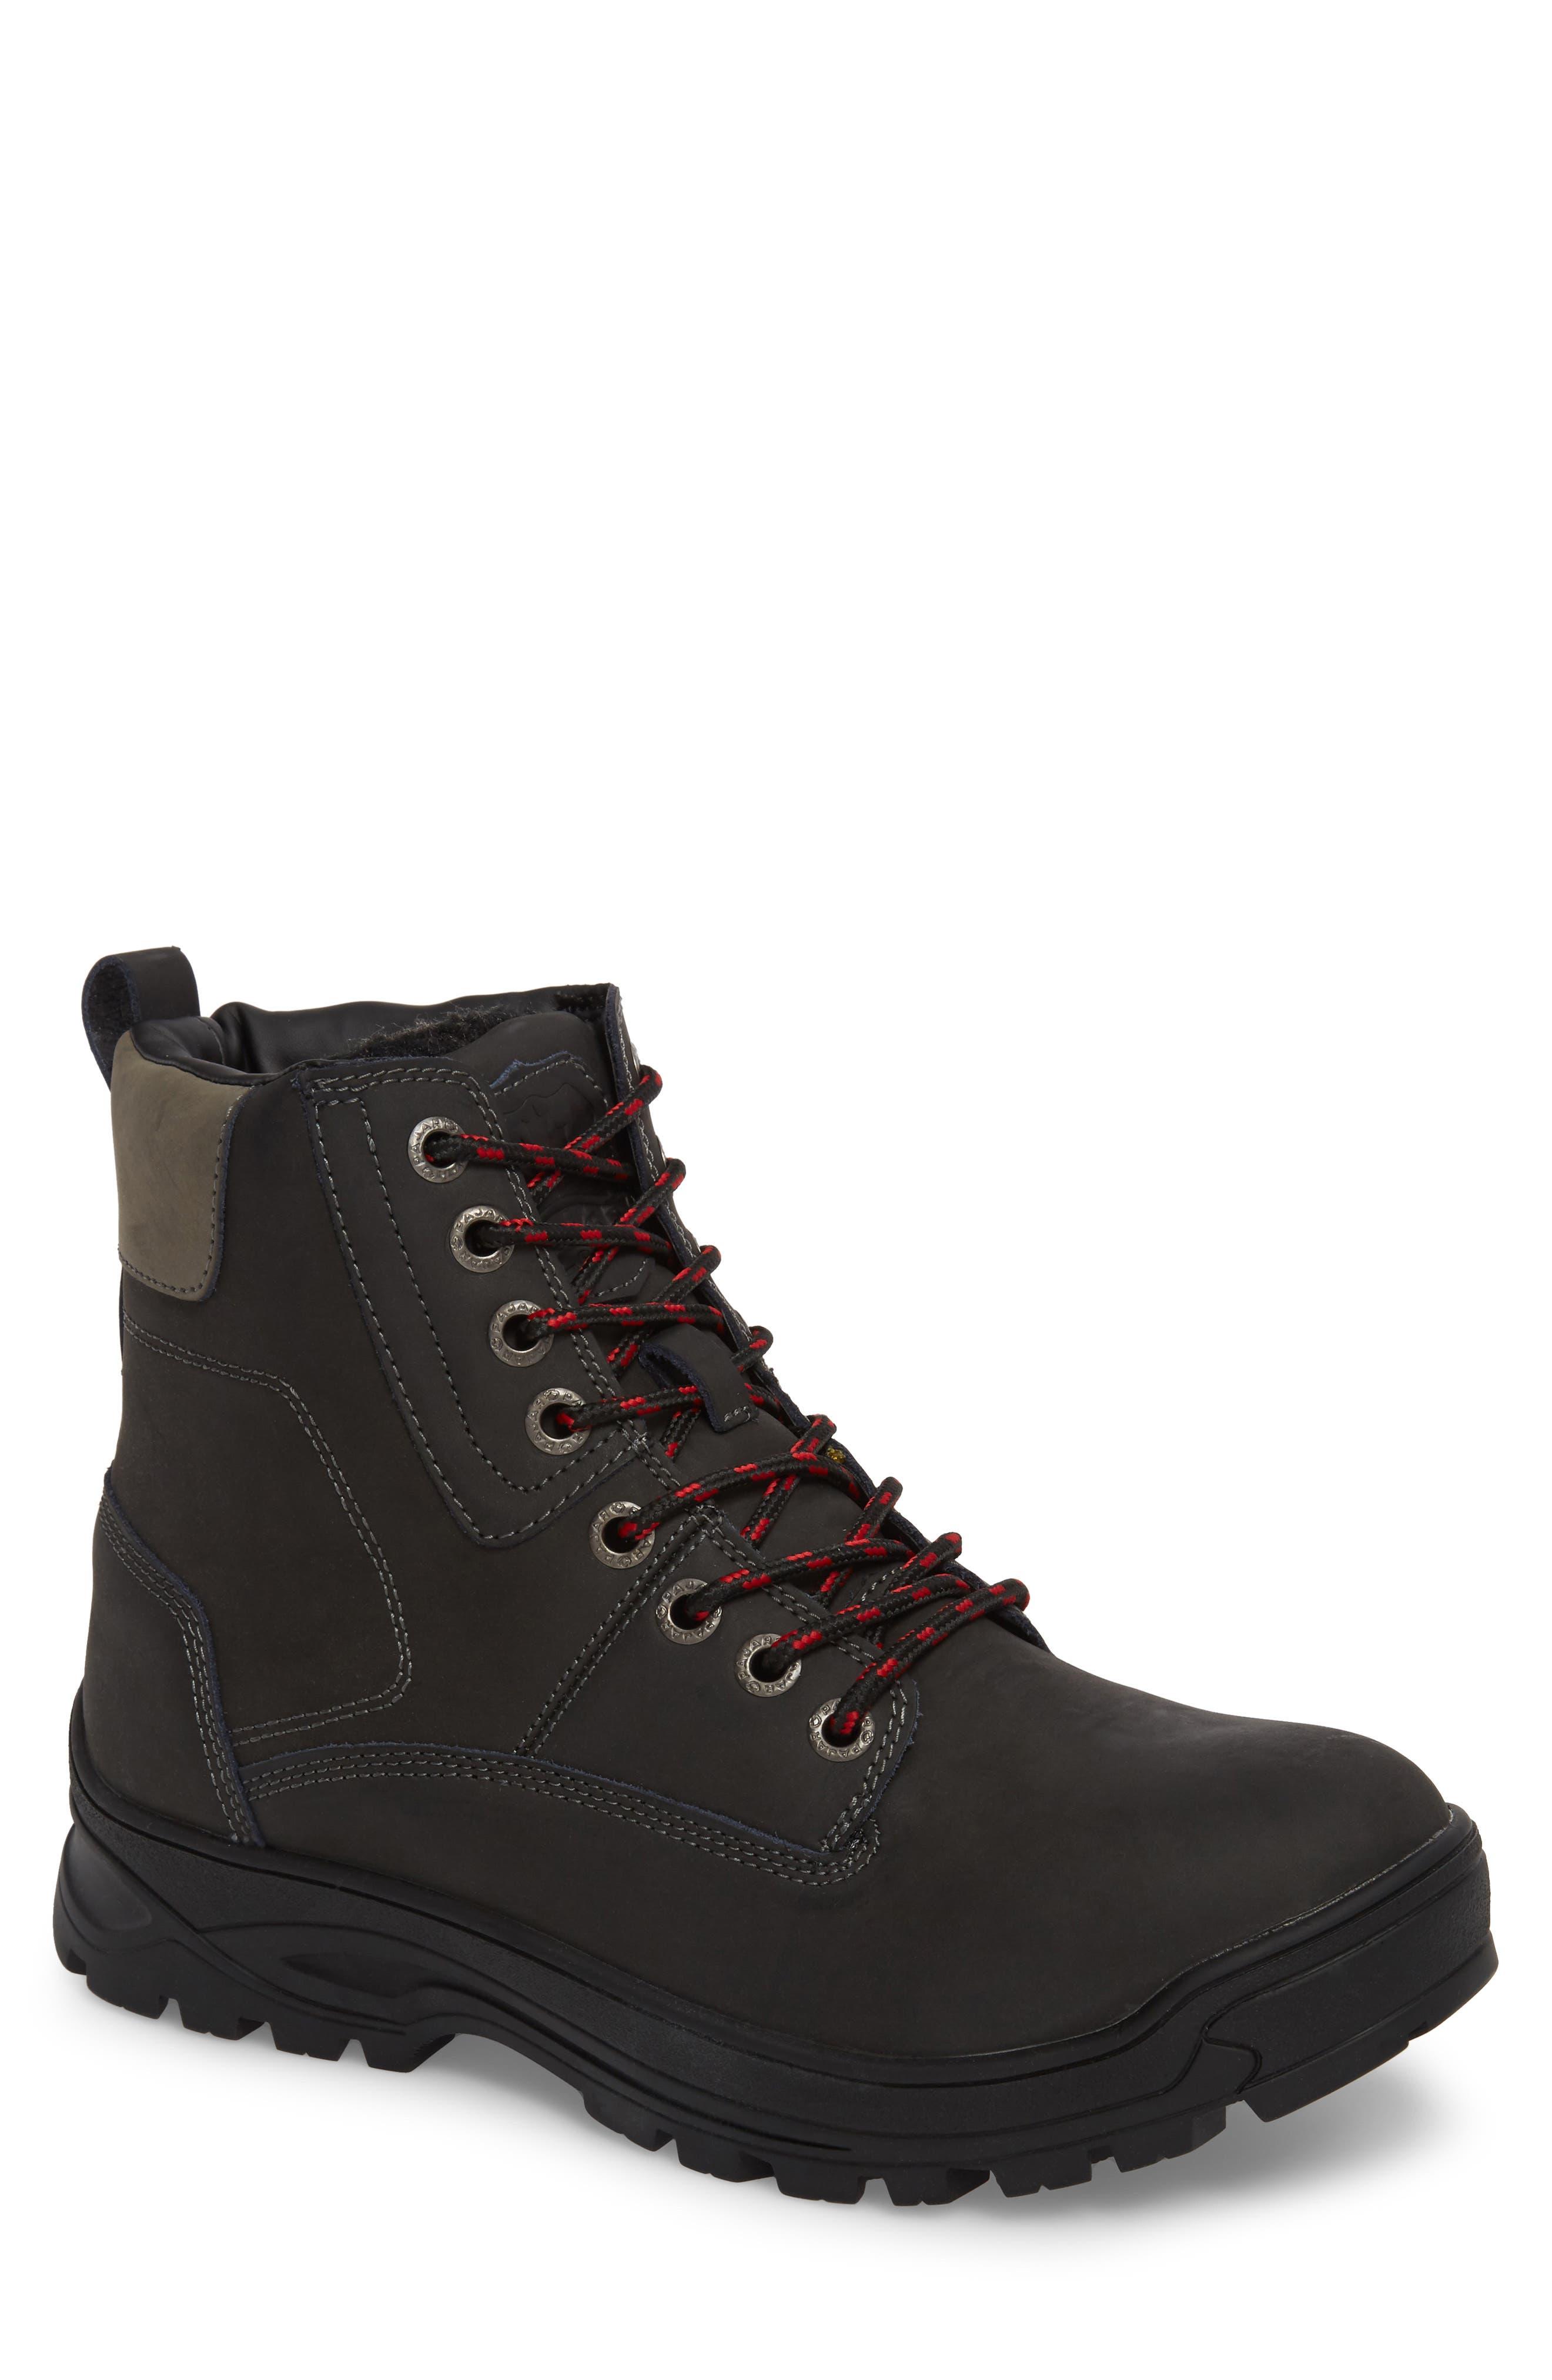 Imani Waterproof Insulated Boot,                             Main thumbnail 1, color,                             001